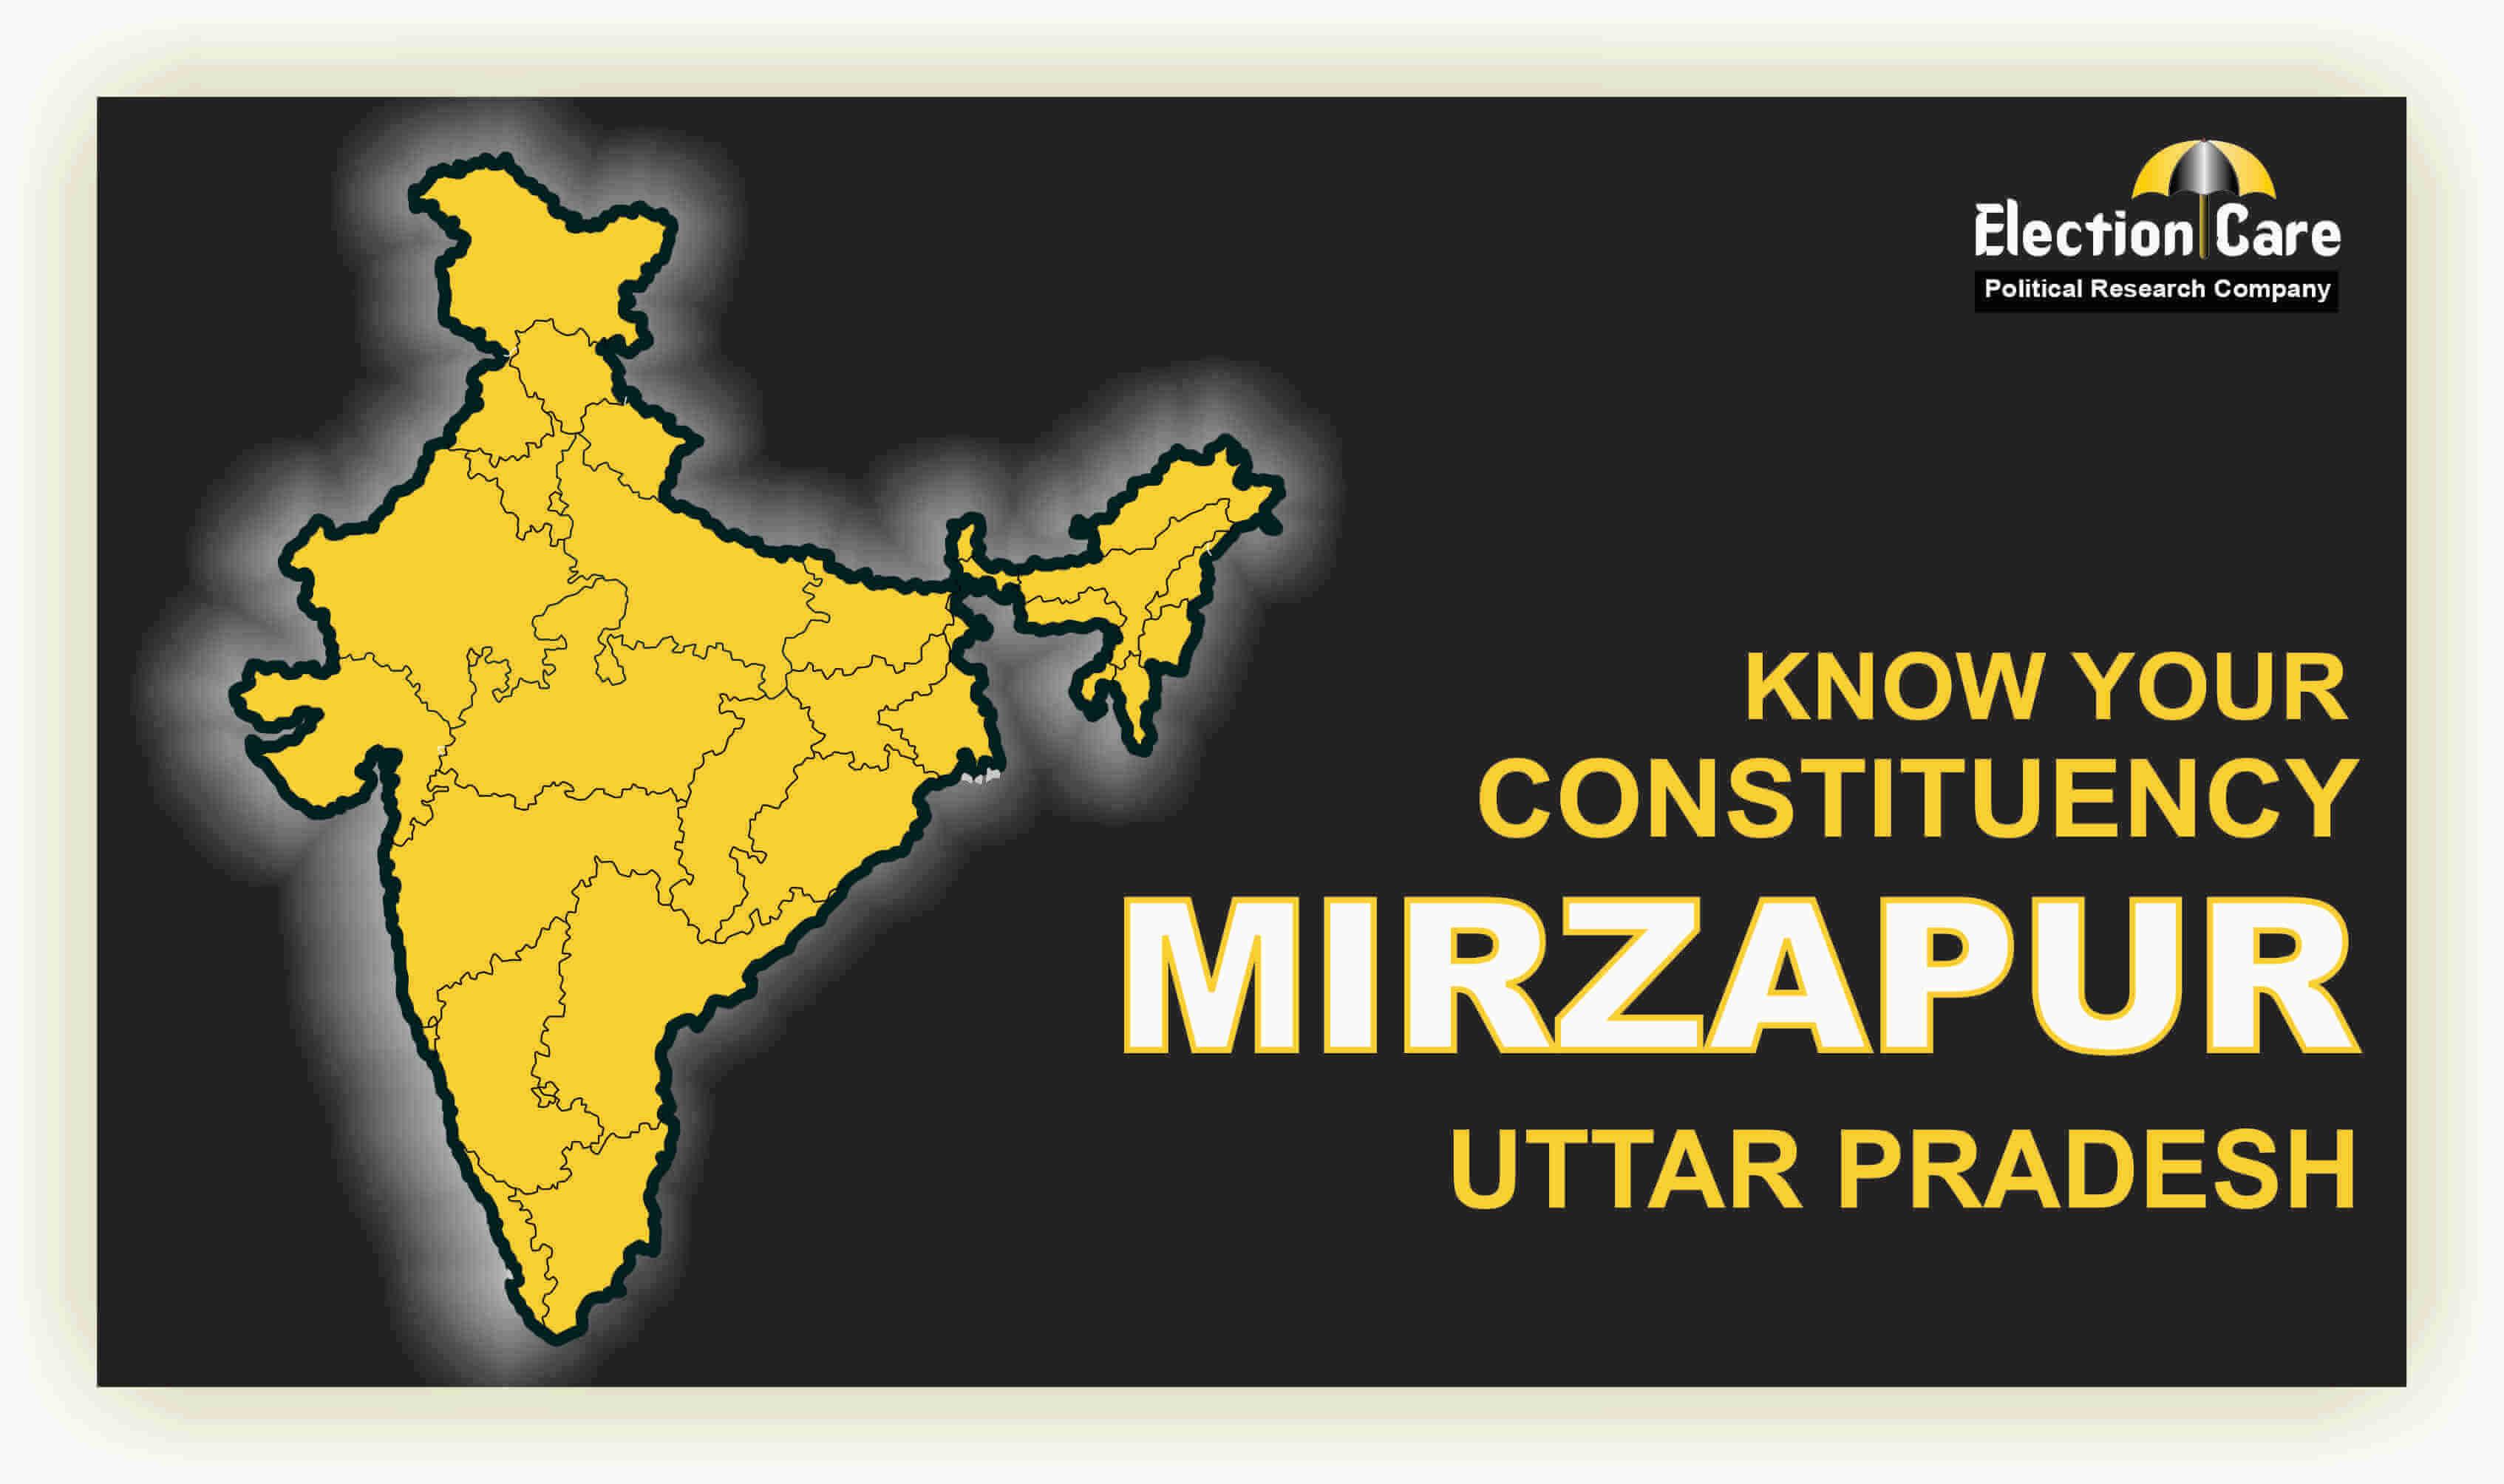 Mirzapur Parliament Election Result